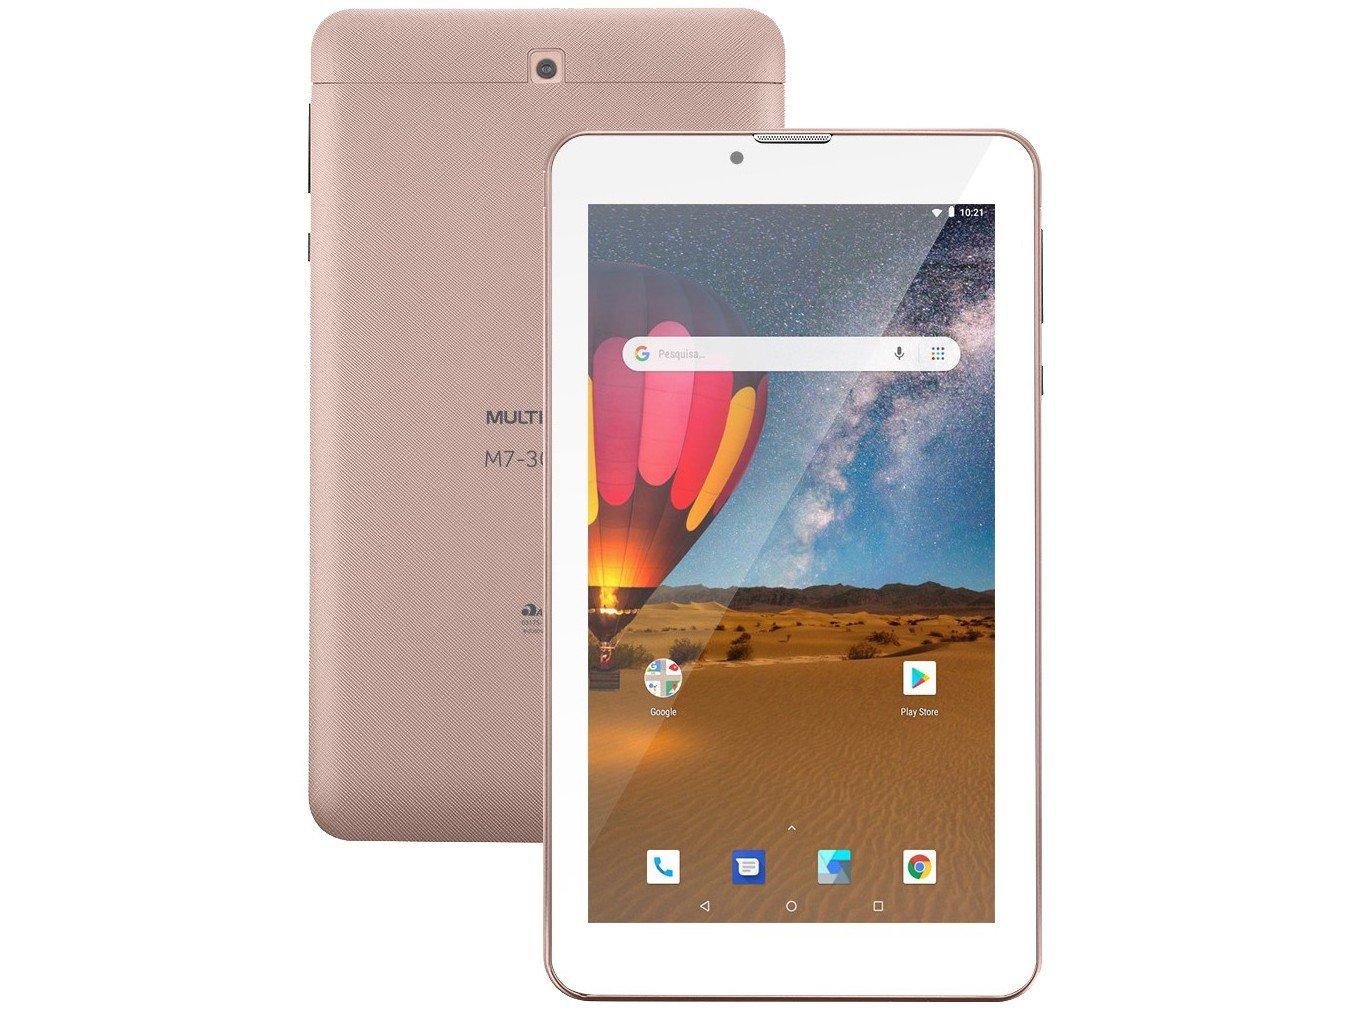 "Tablet Multilaser M7 3G Plus NB305 16GB 7"" - 3G Wi-Fi Android 8.0 Quad Core Câmera Integrada - Bivolt"